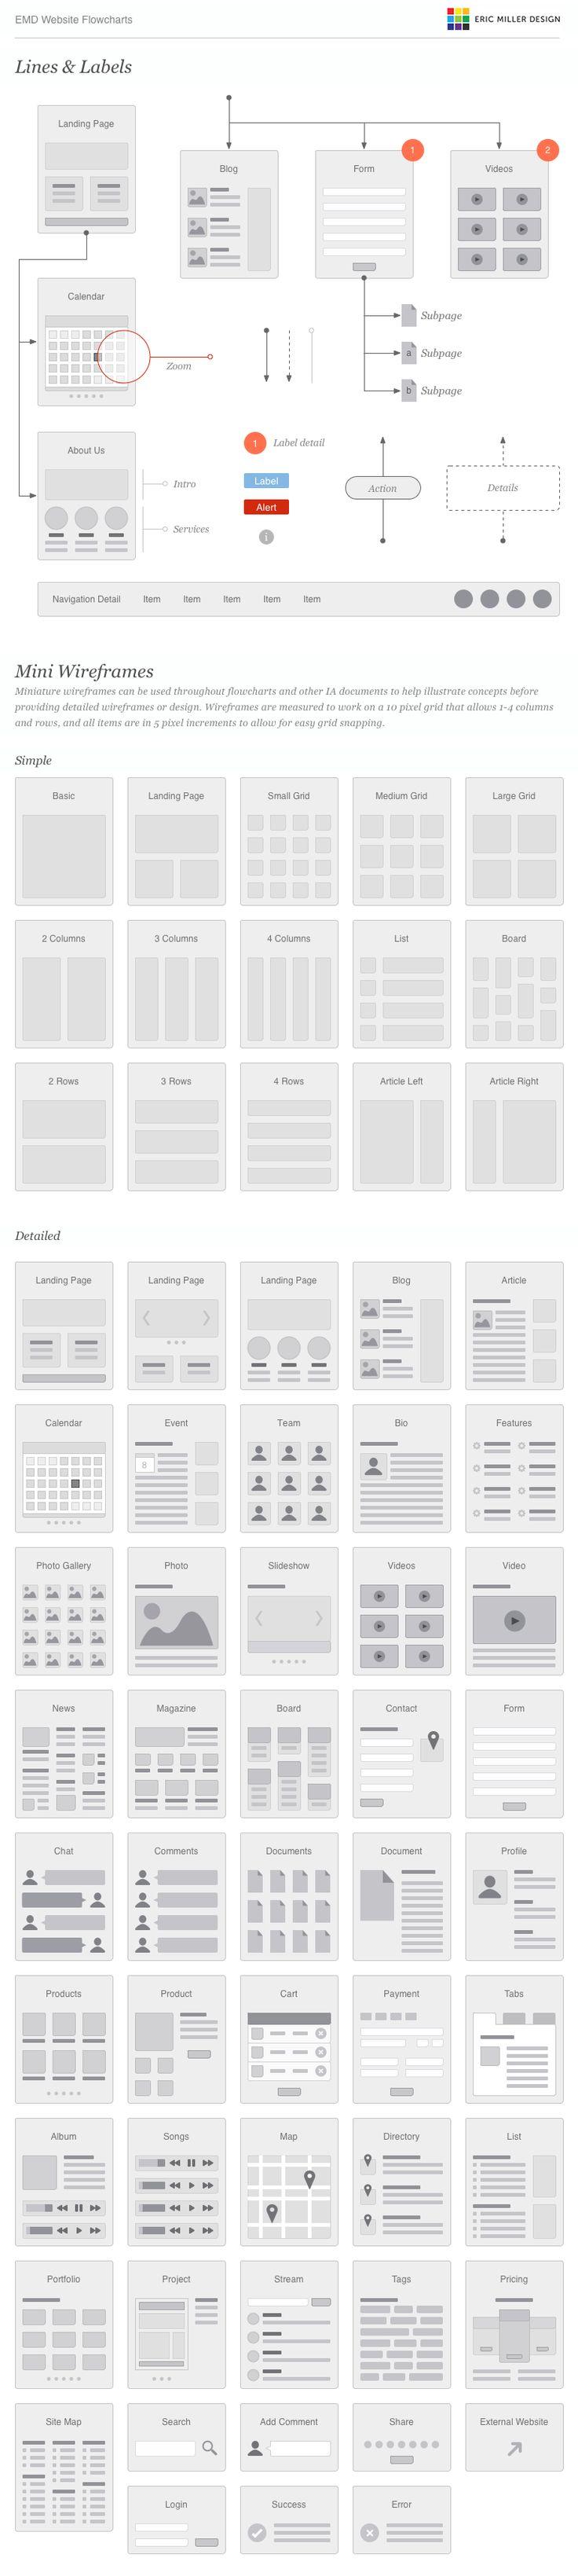 Web site Flowcharts | graffletopia.com